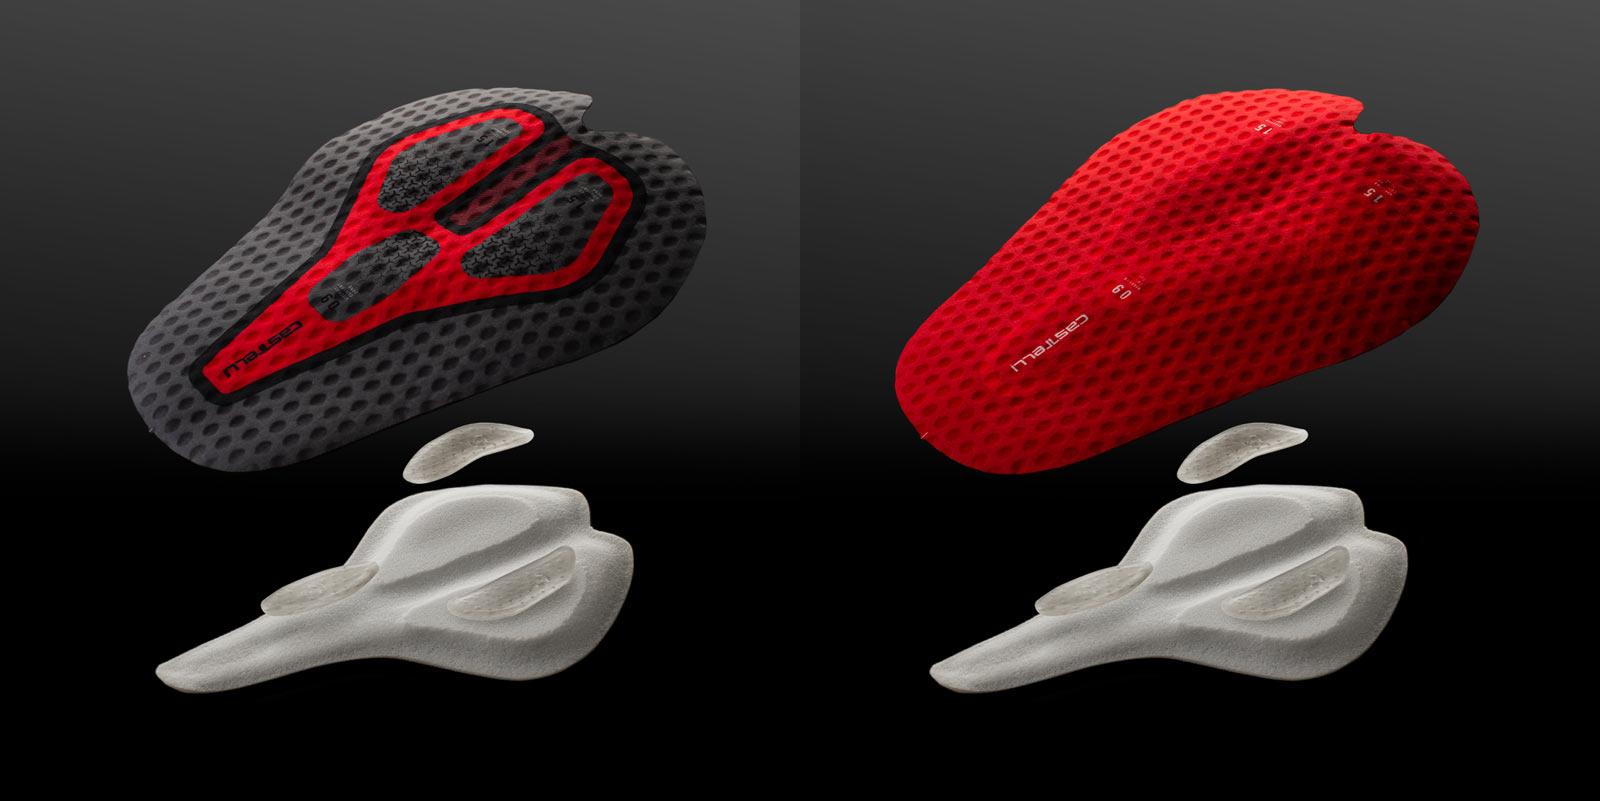 2021 castelli progetto x2 bike shorts padding for men and women